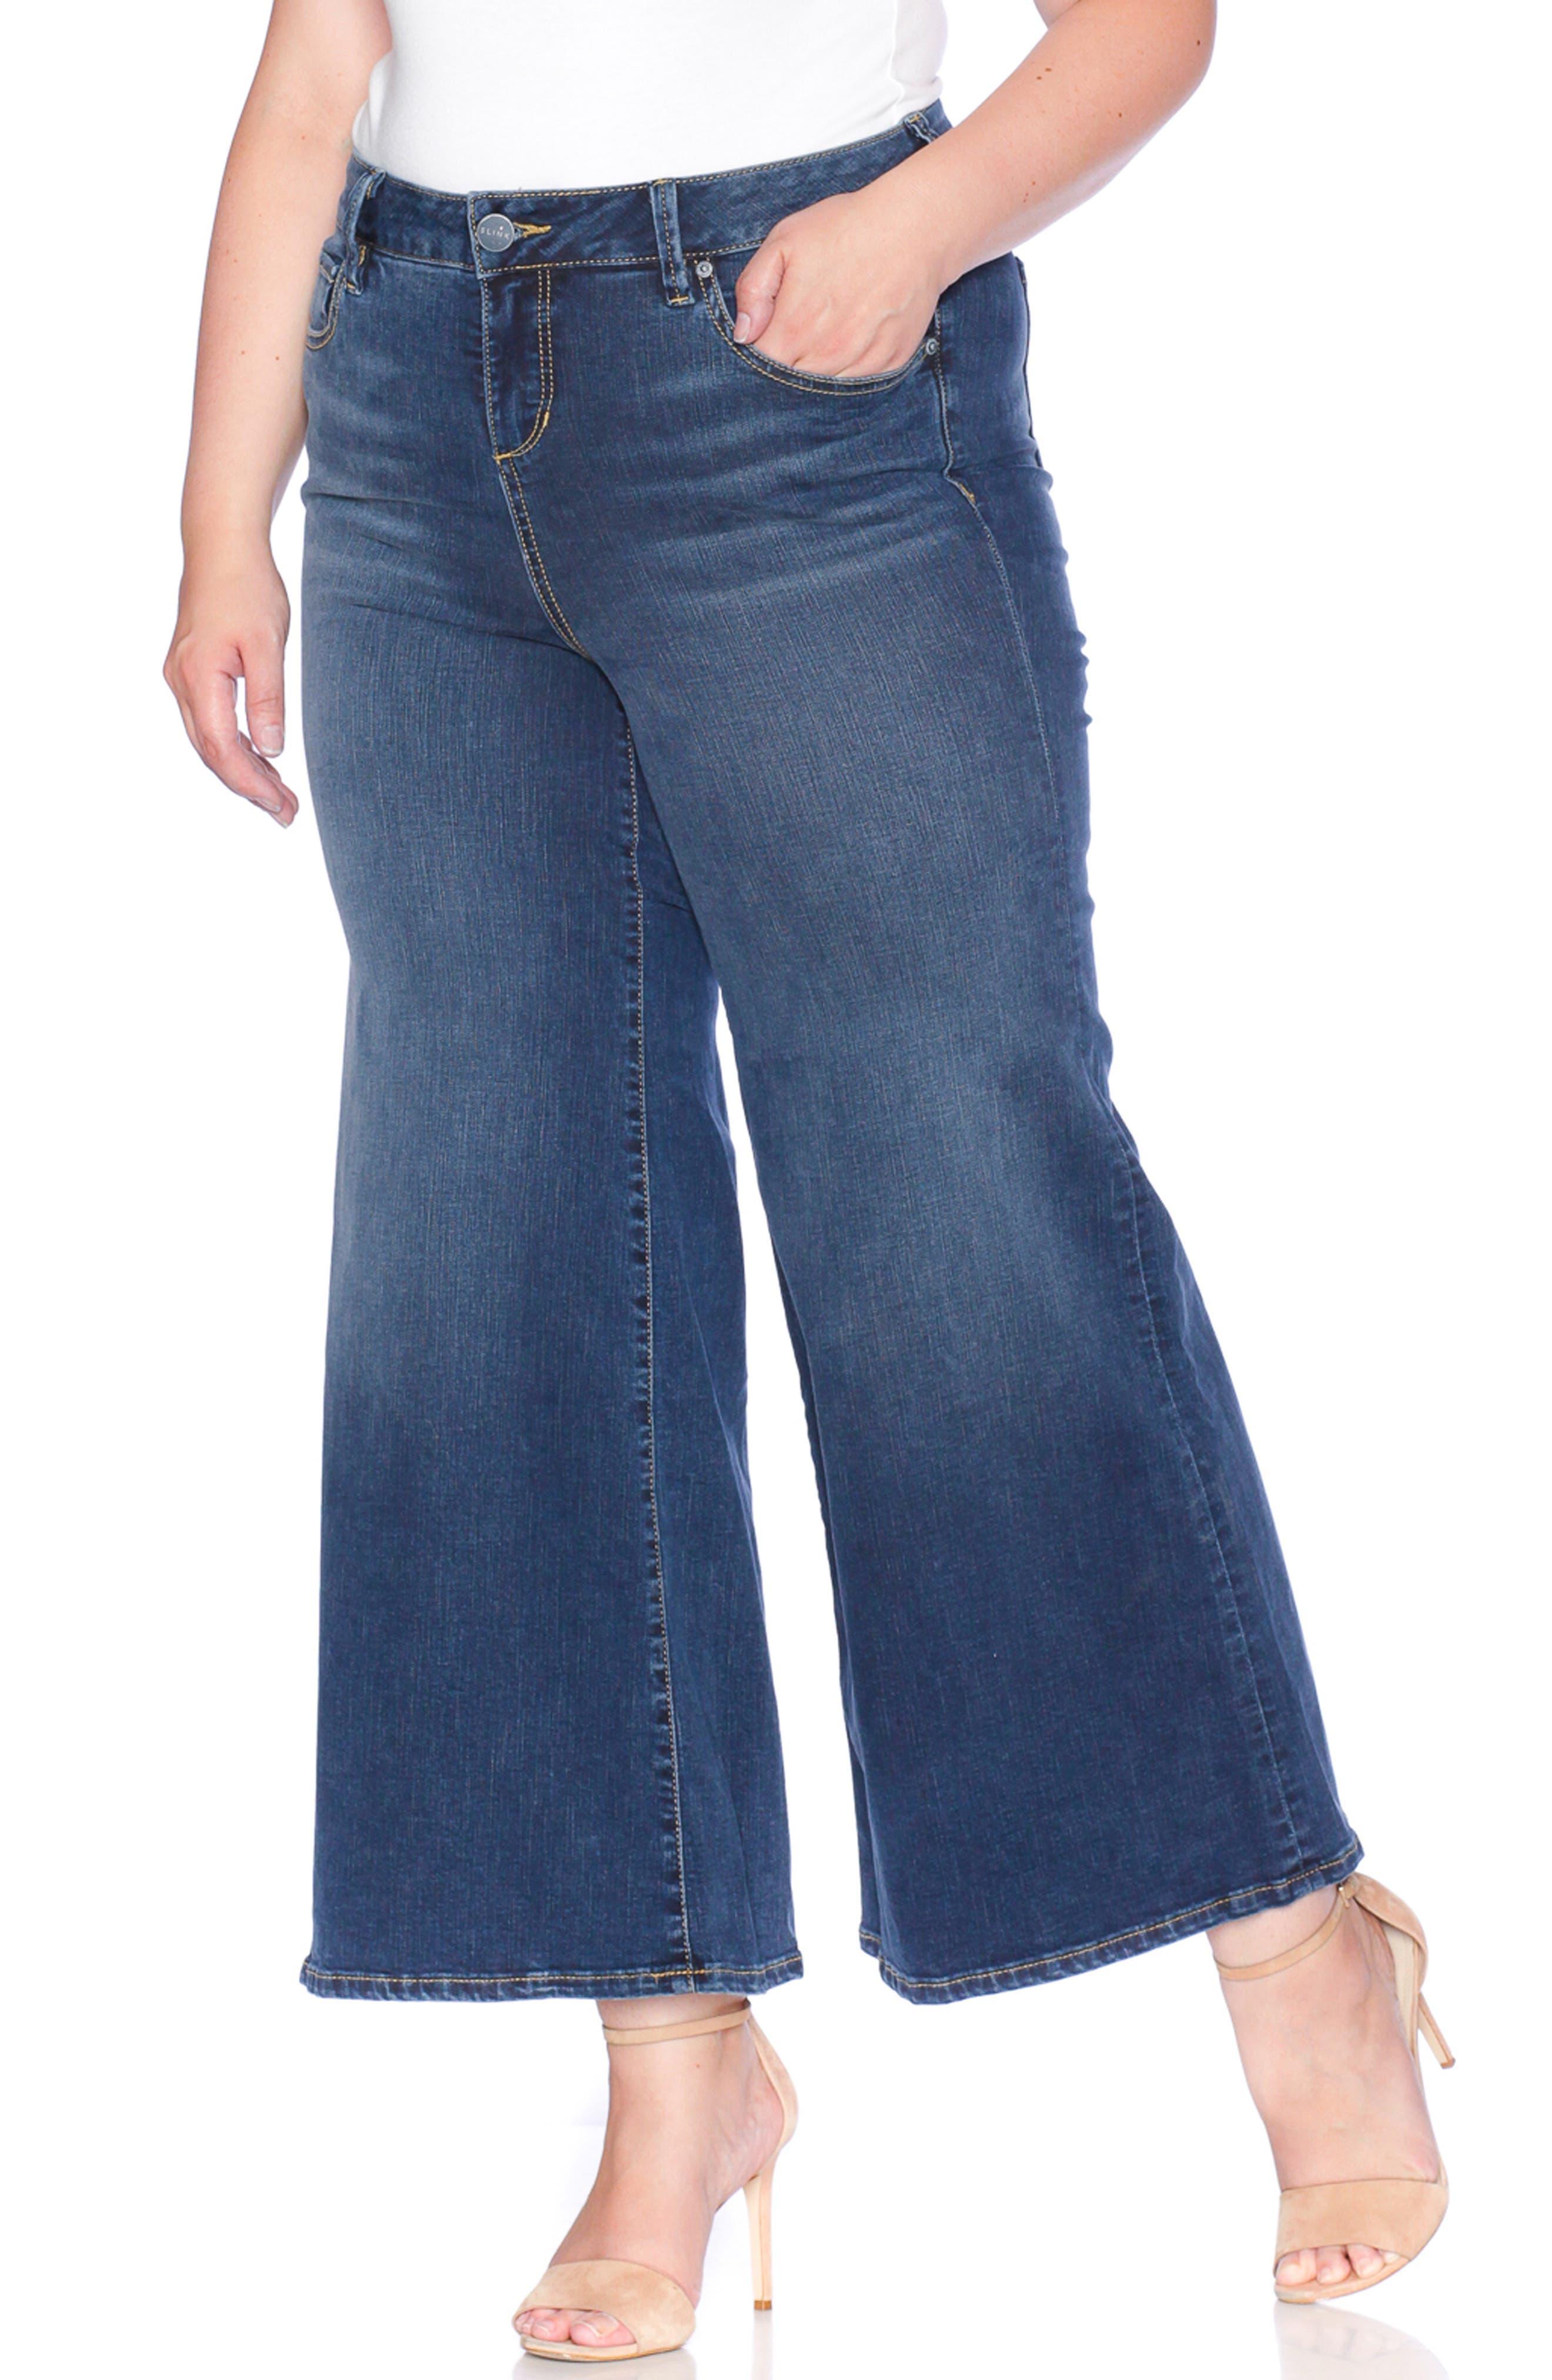 SLINK JEANS, SLINK High Waist Wide Leg Crop Jeans, Main thumbnail 1, color, HEATHER